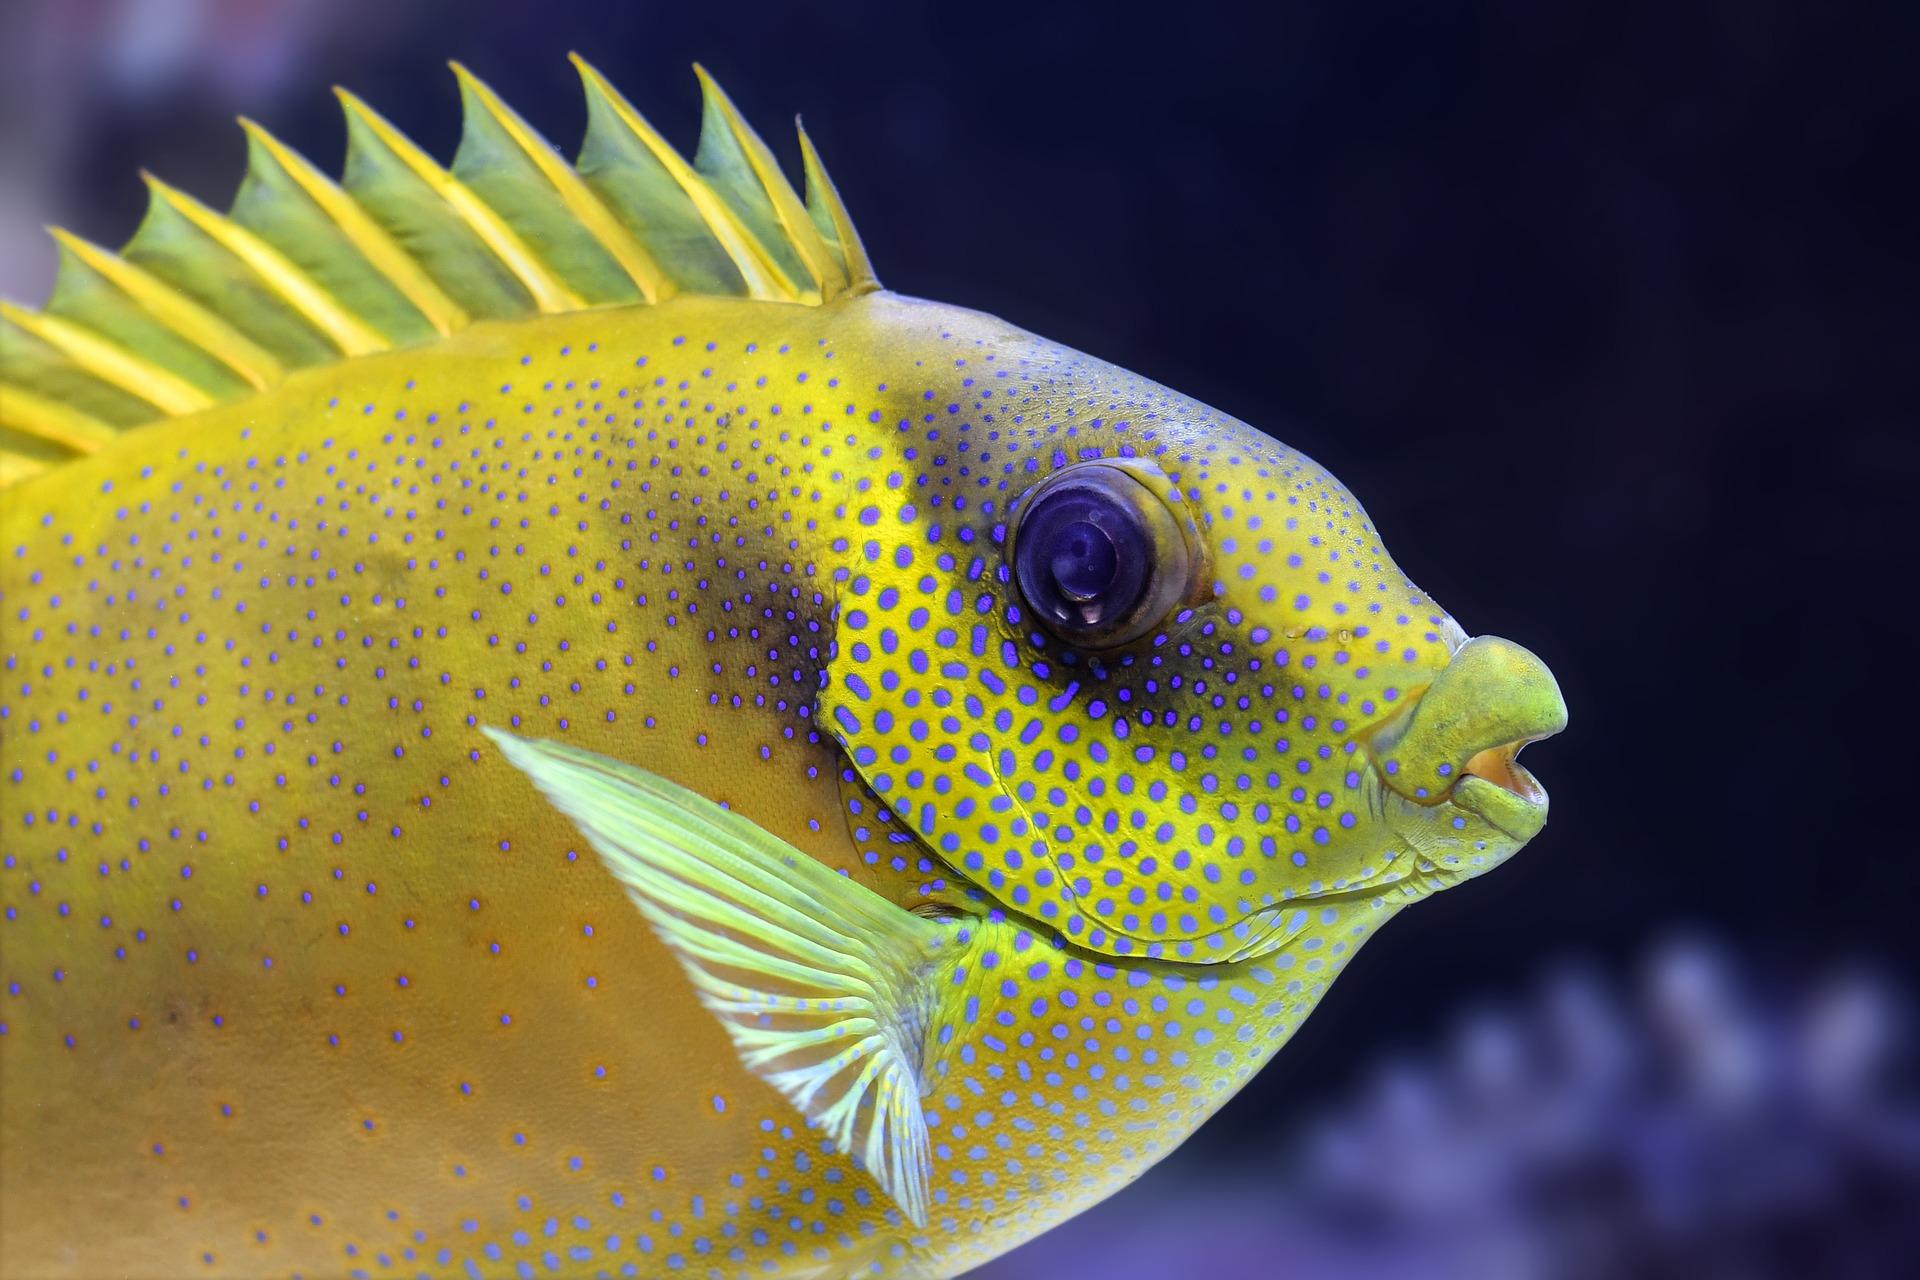 fish-3217645_1920.jpg